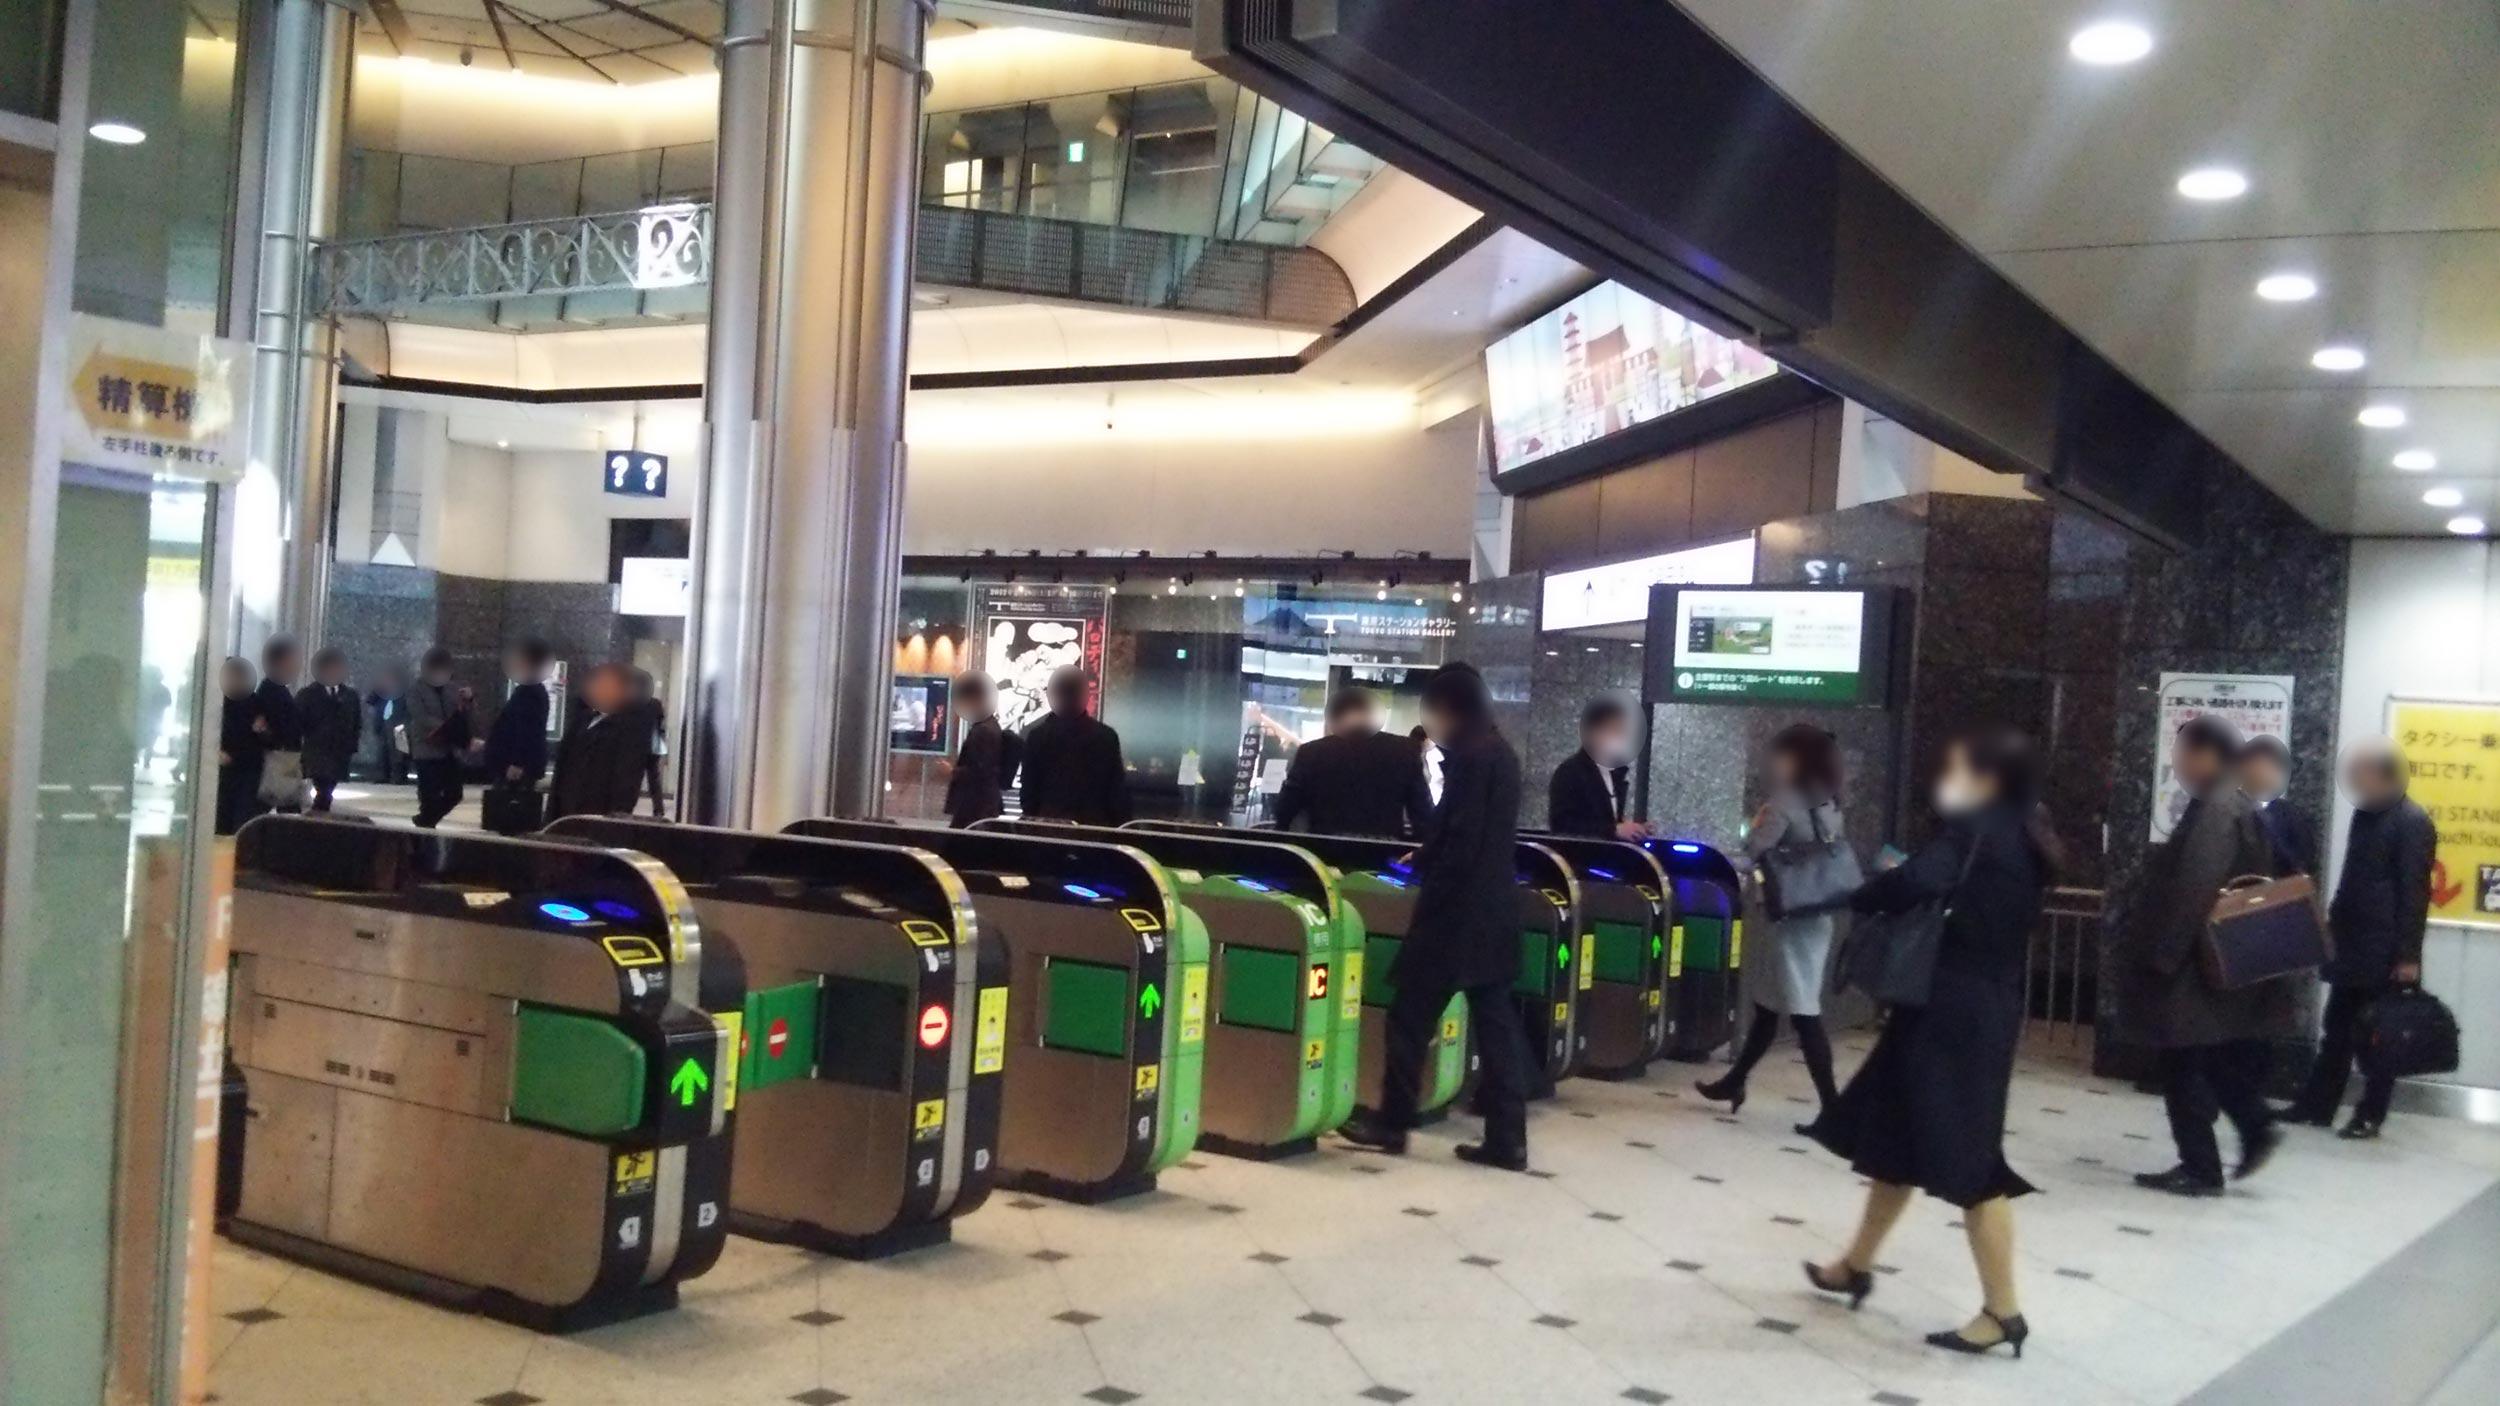 okiphoto【無料・商用可】漫画用資料・フリー素材写真:東京駅構内、改札